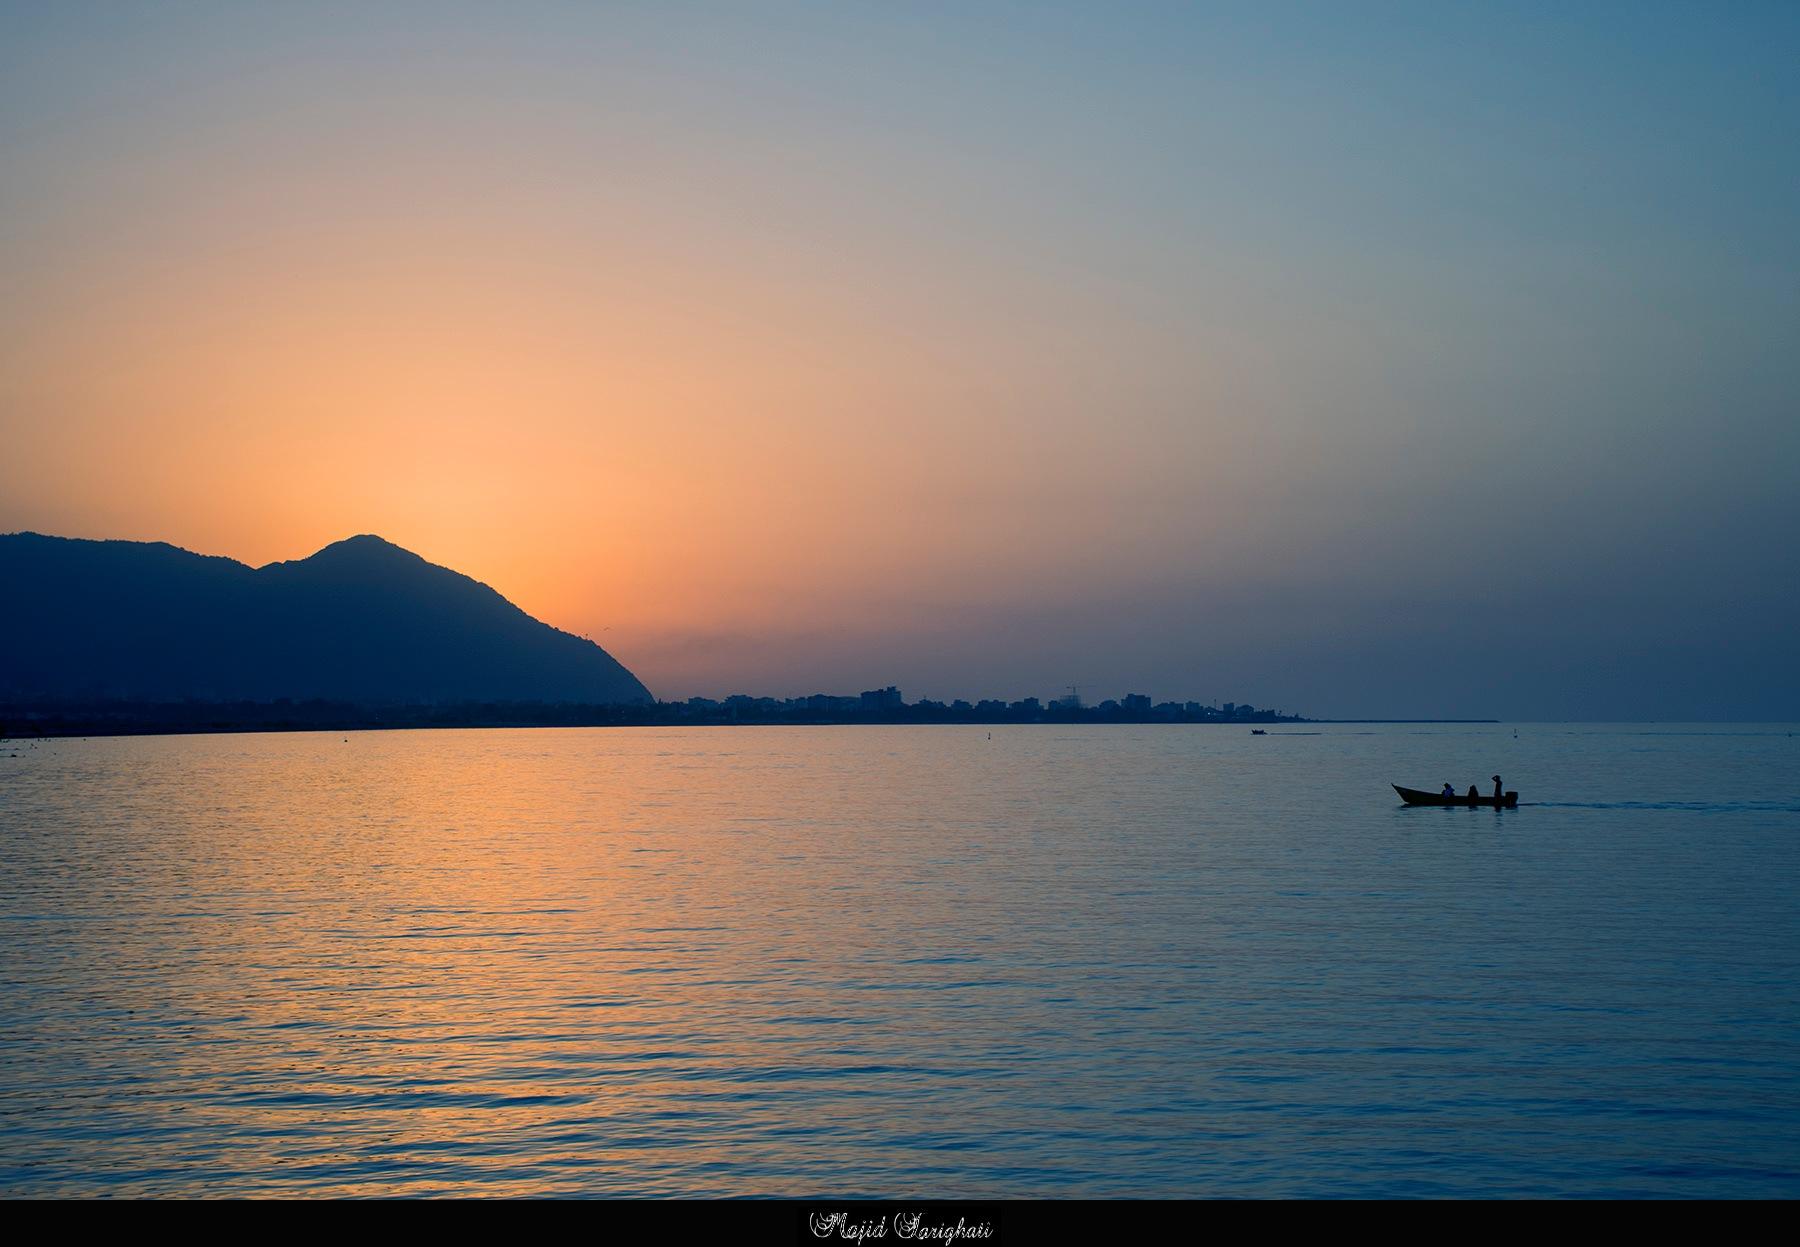 Ramsar beach by Majid Tarighati